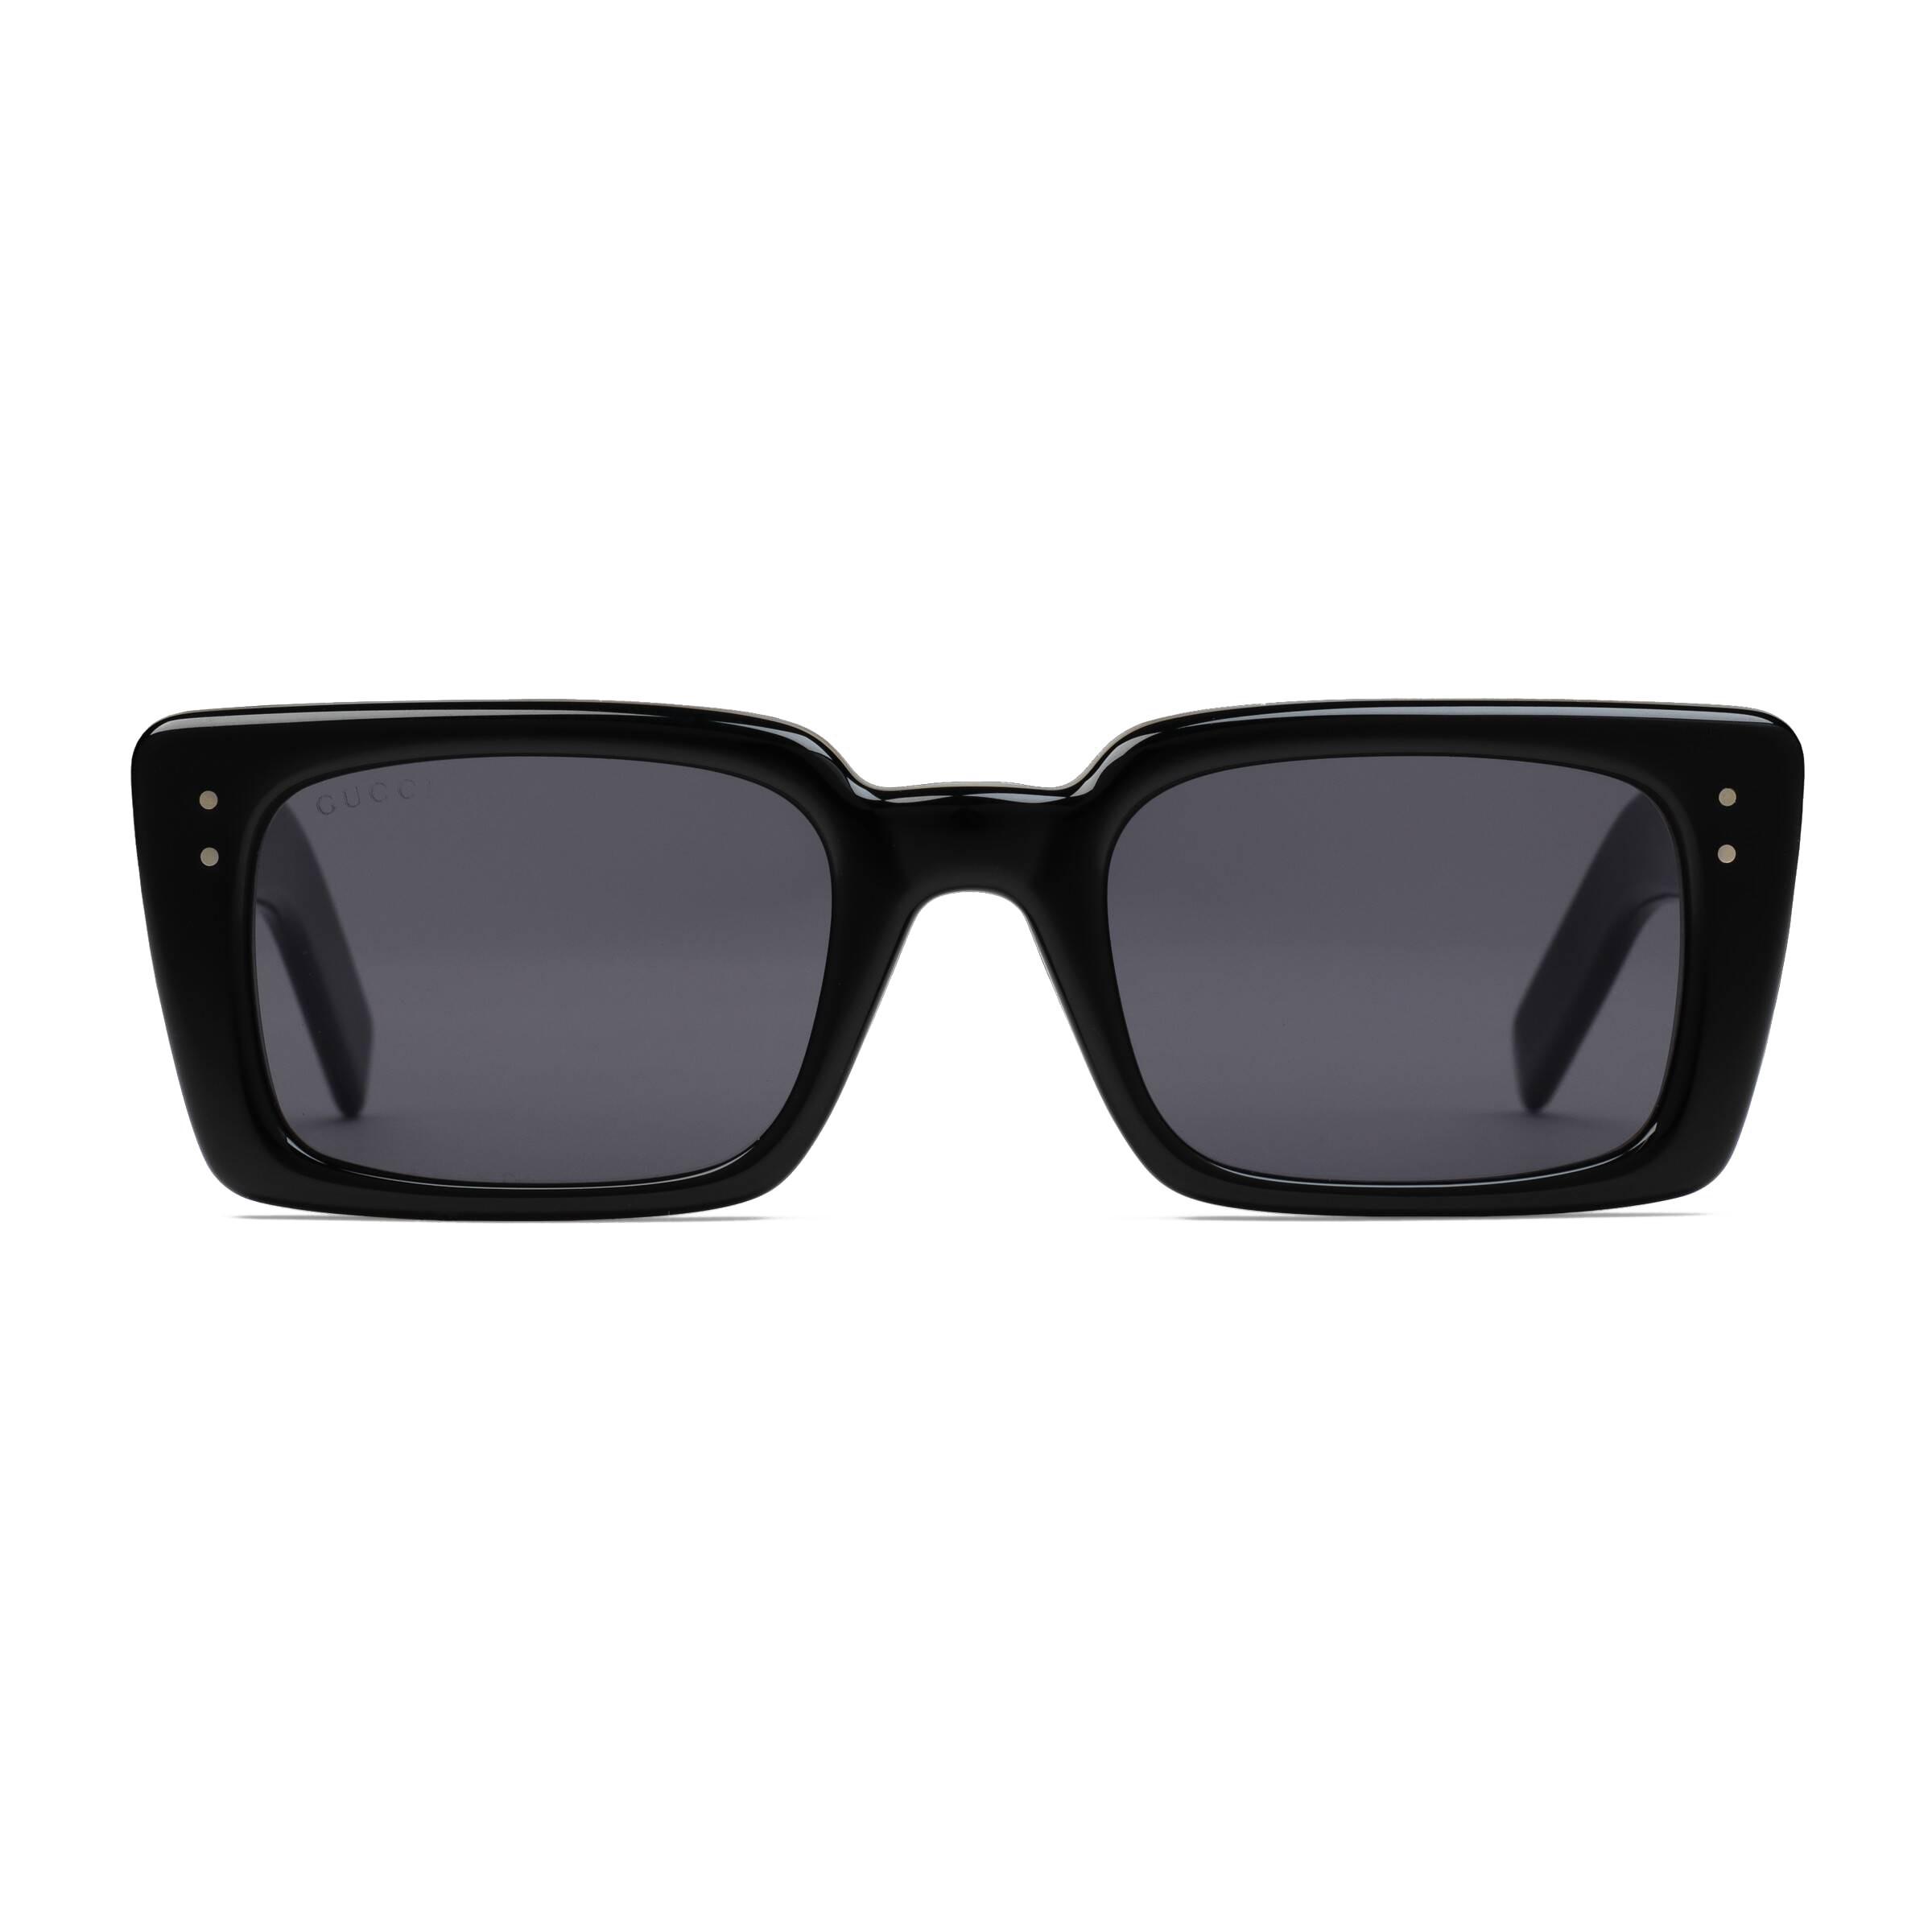 0af424762 Gucci - Rectangular Acetate Sunglasses - Black - Gucci Eyewear - Avvenice